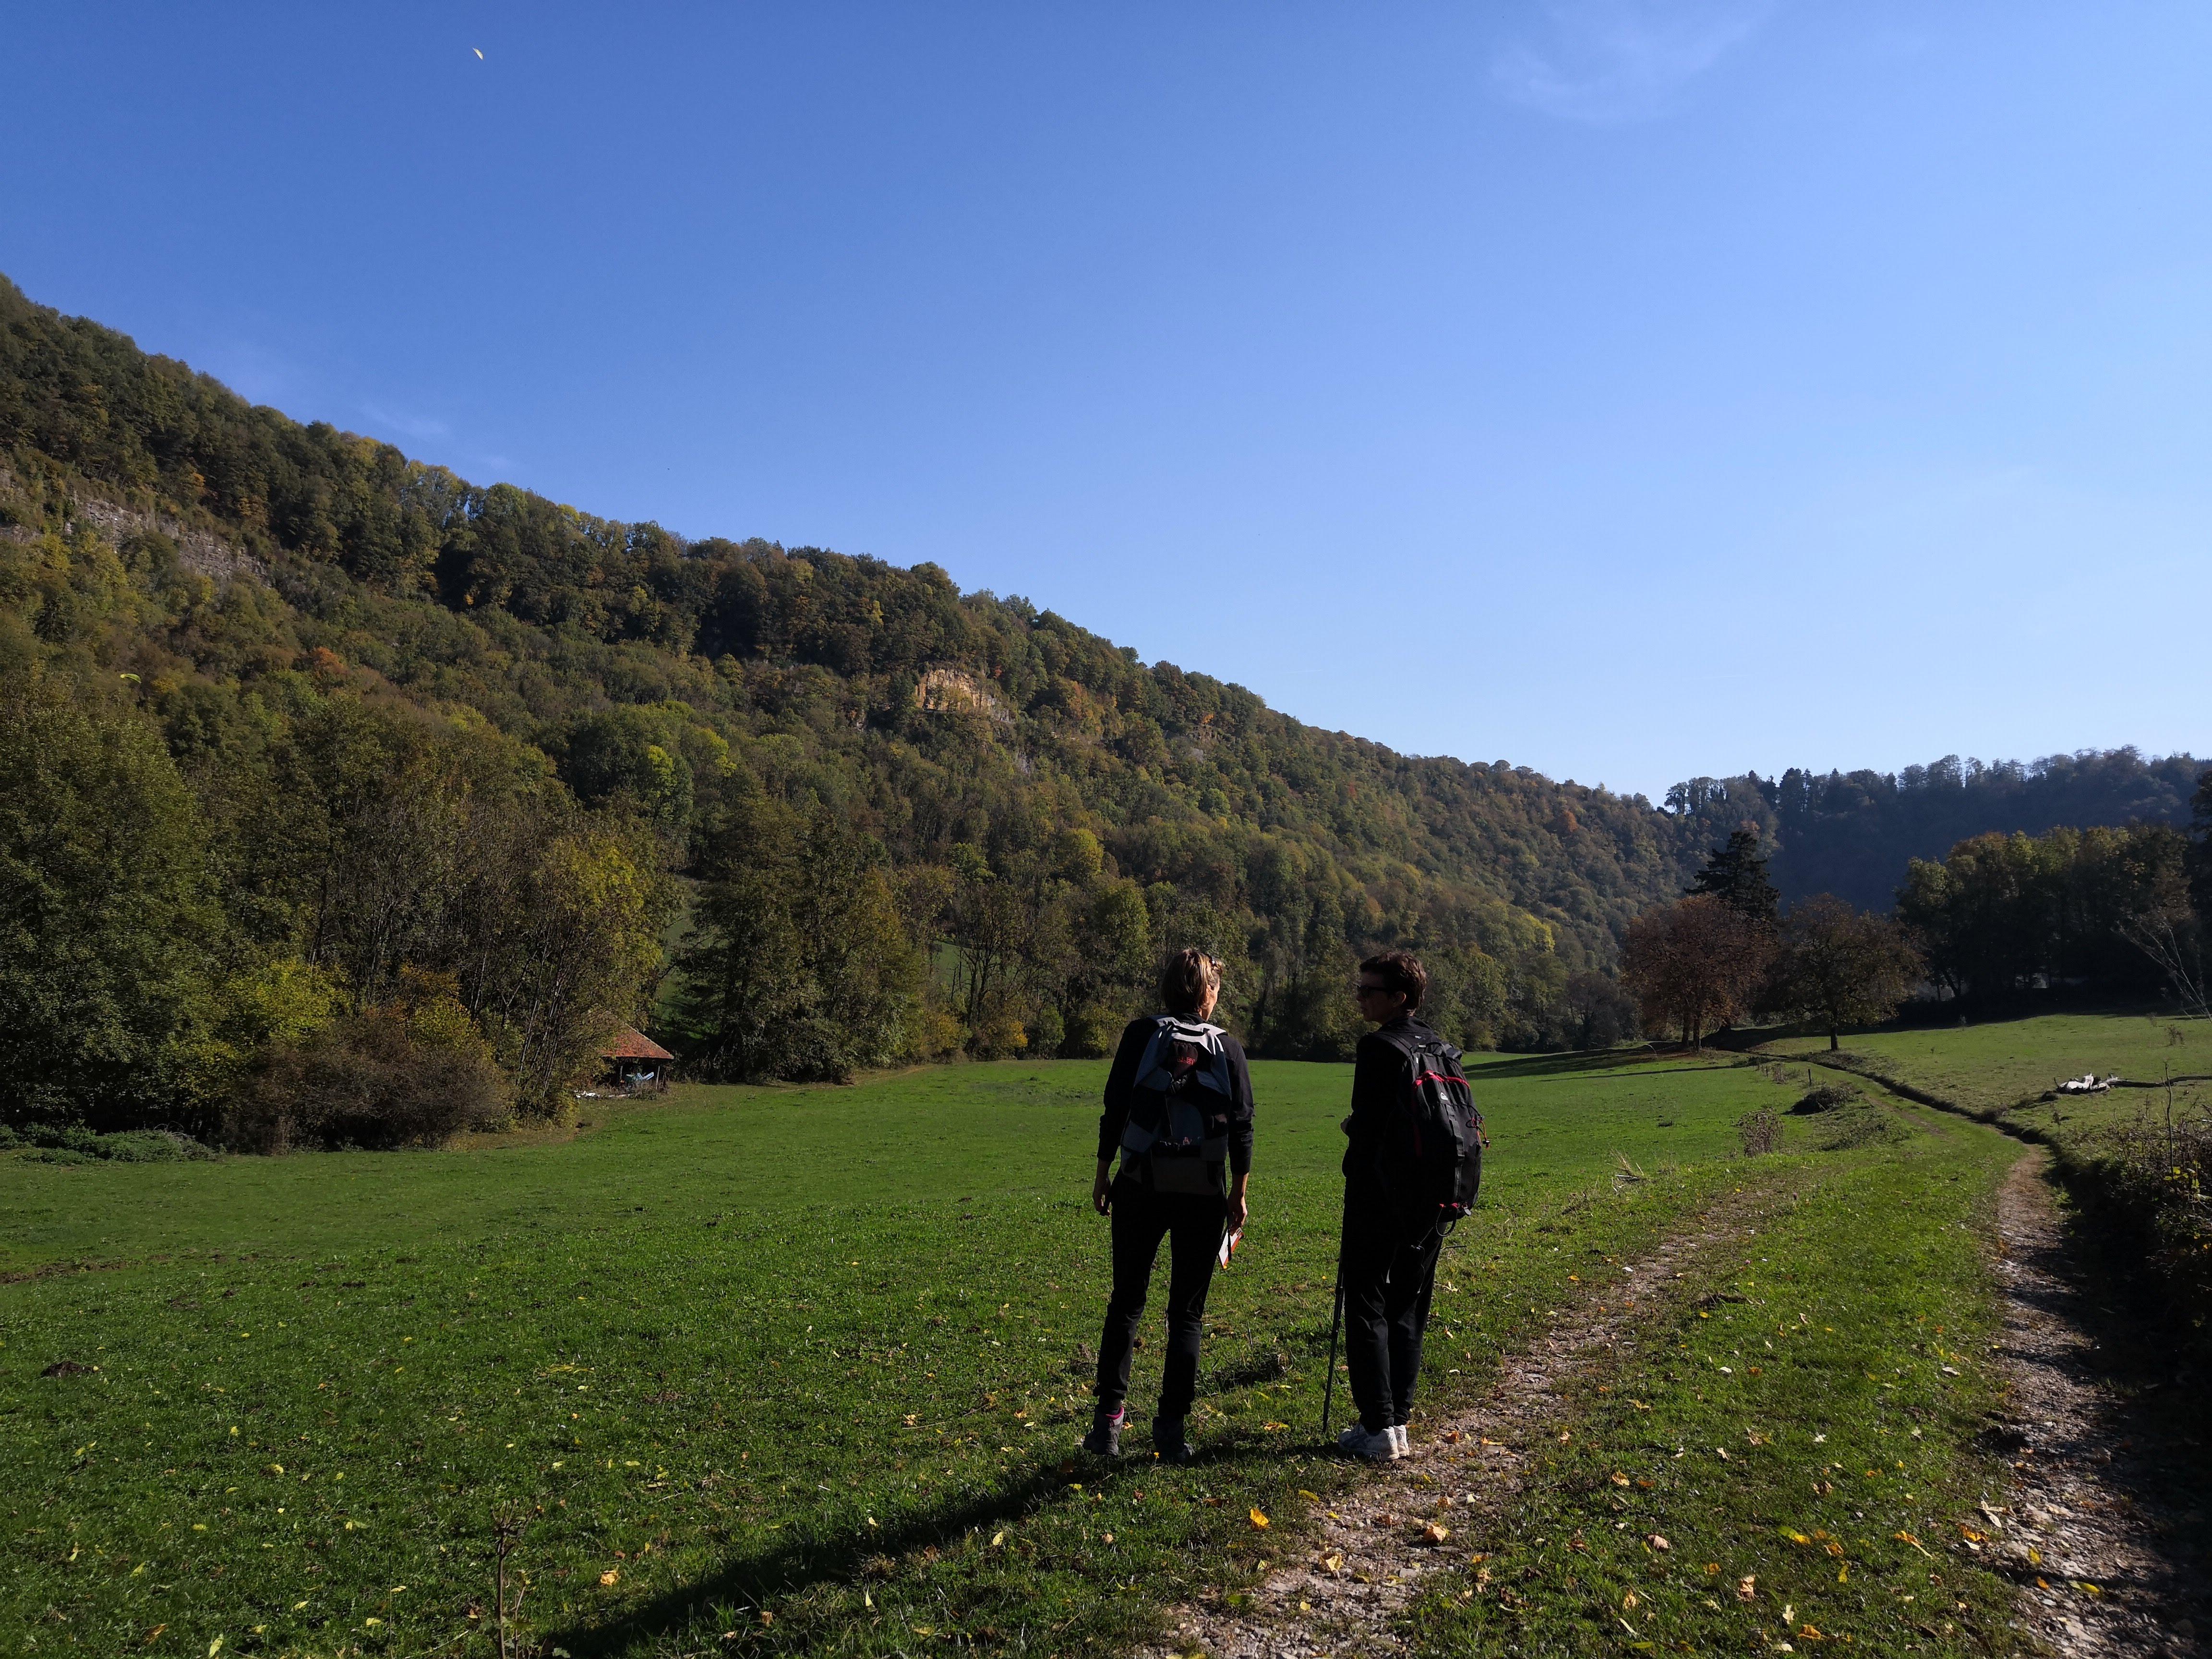 Randonnée Jura - Gîte Haut Jura